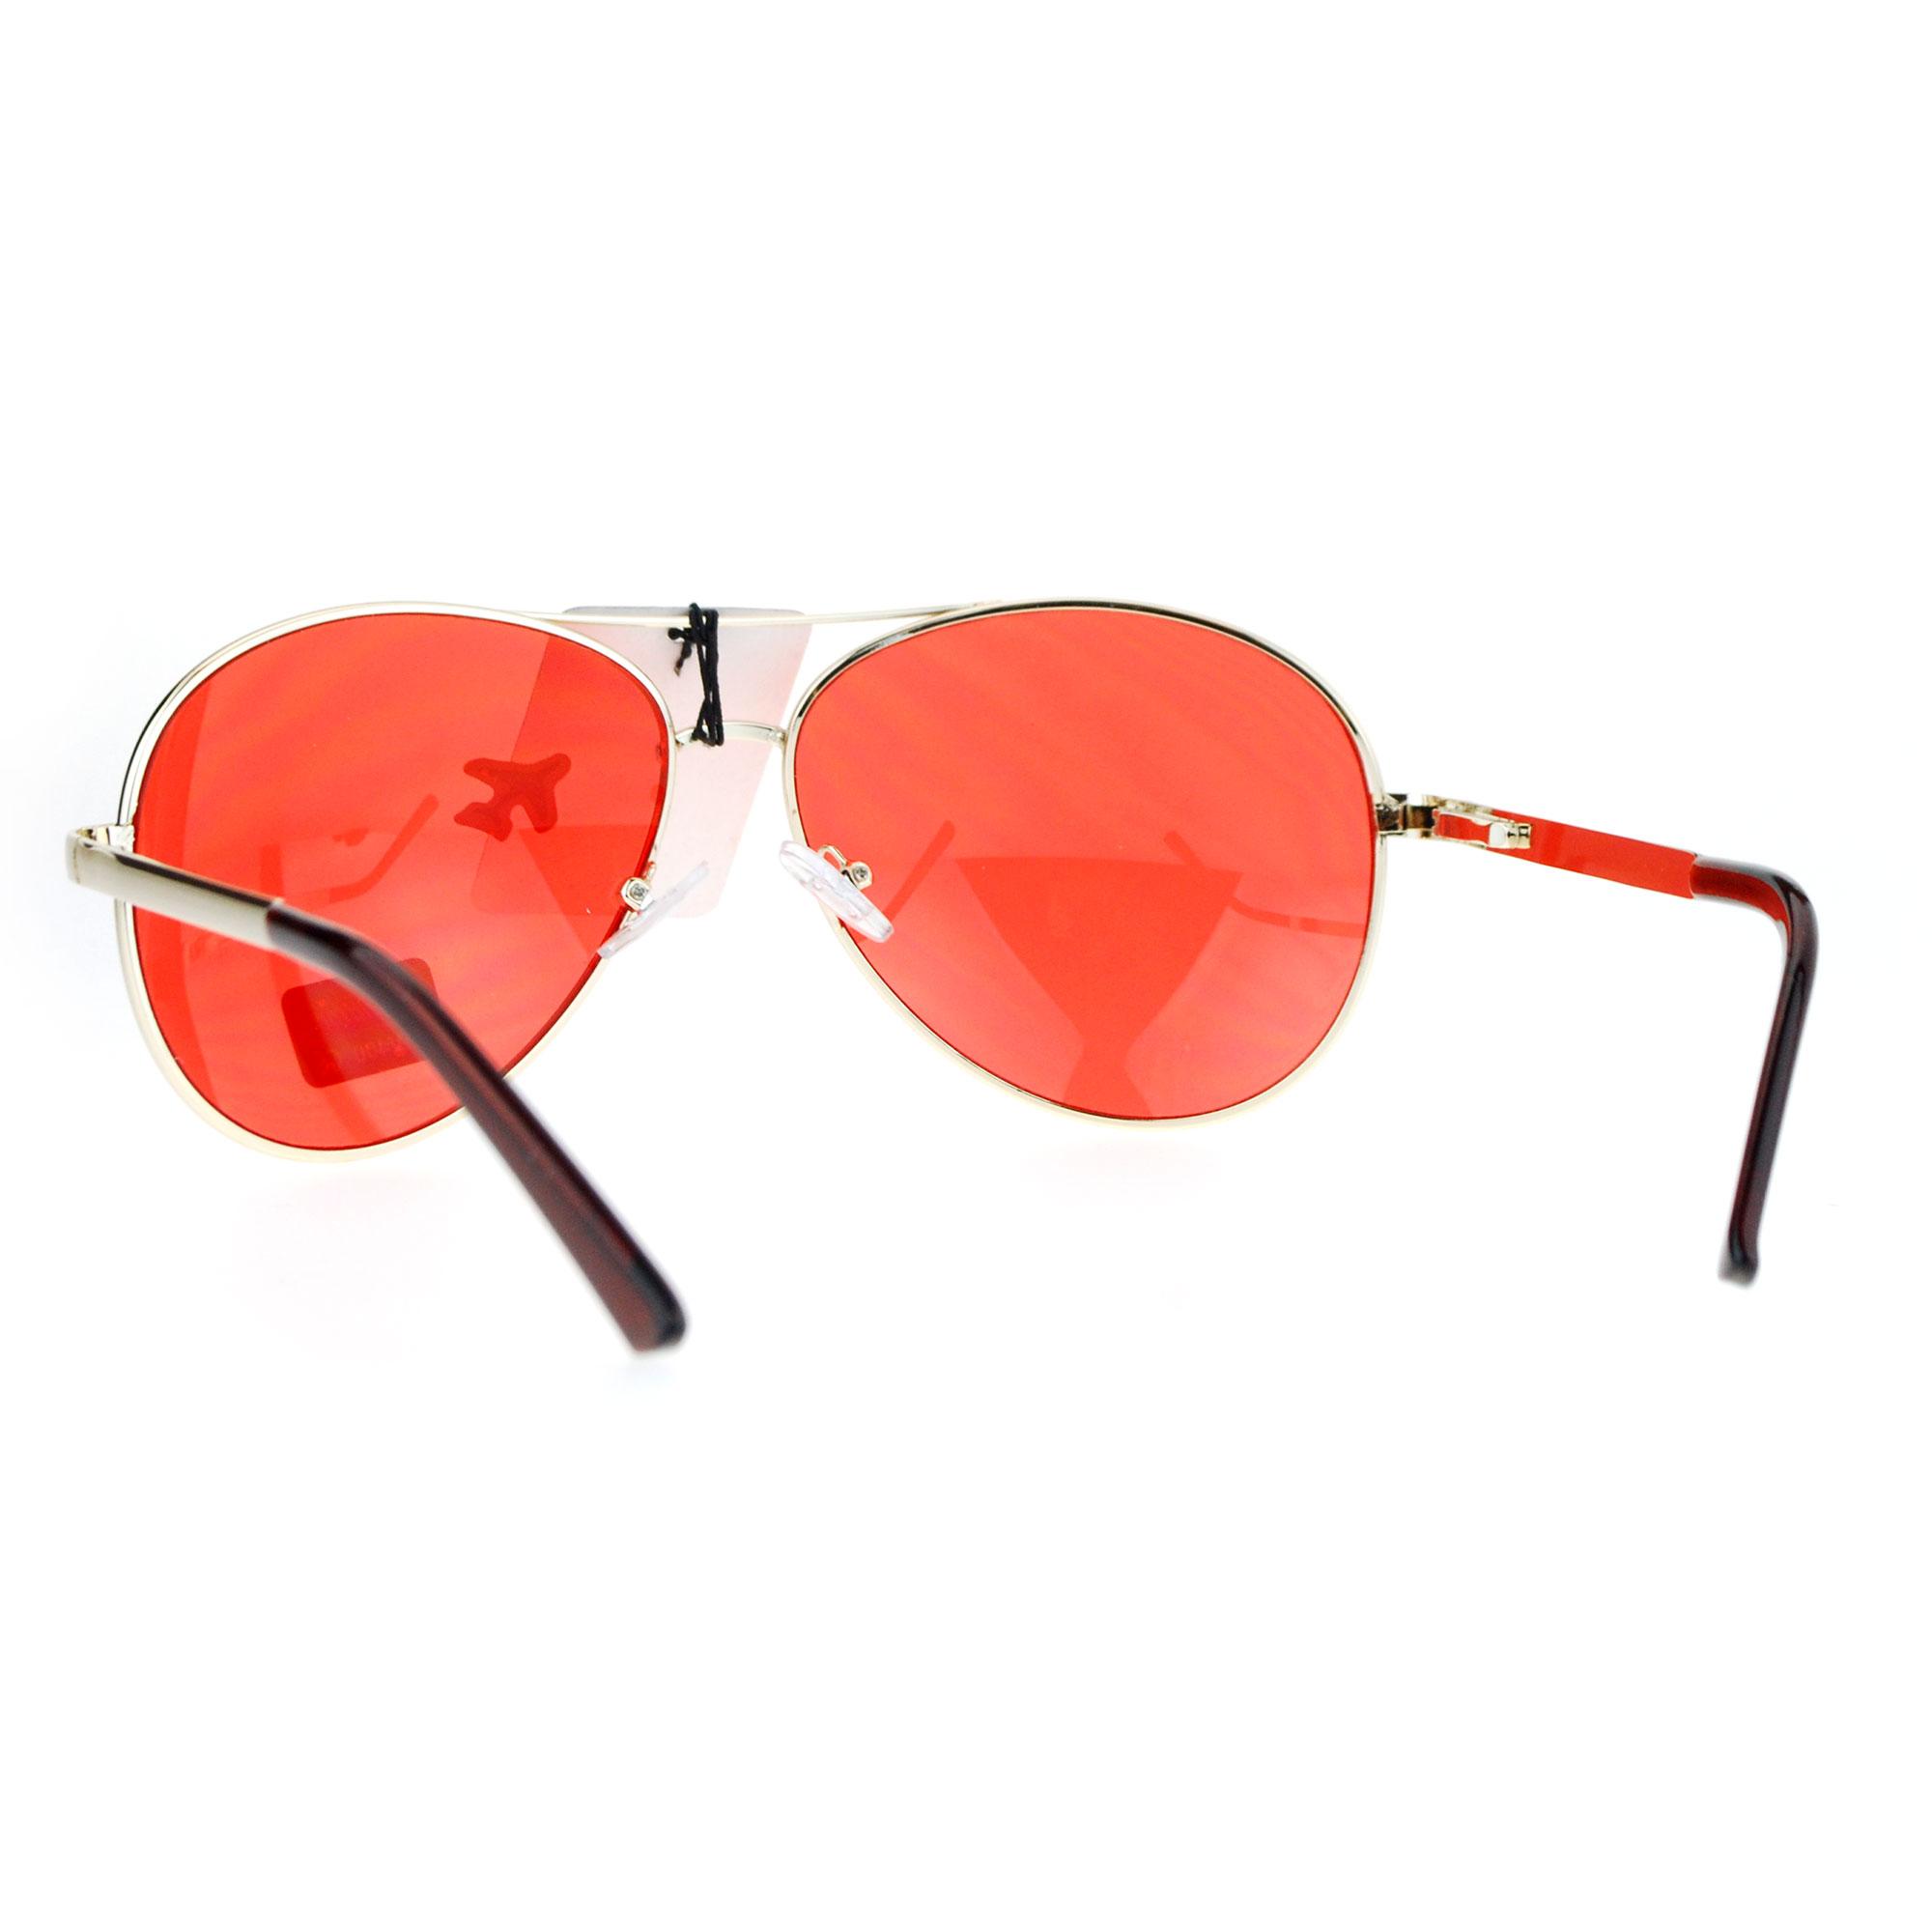 SA106 Red Lens Hollywood Aviator Metal Rim Sunglasses